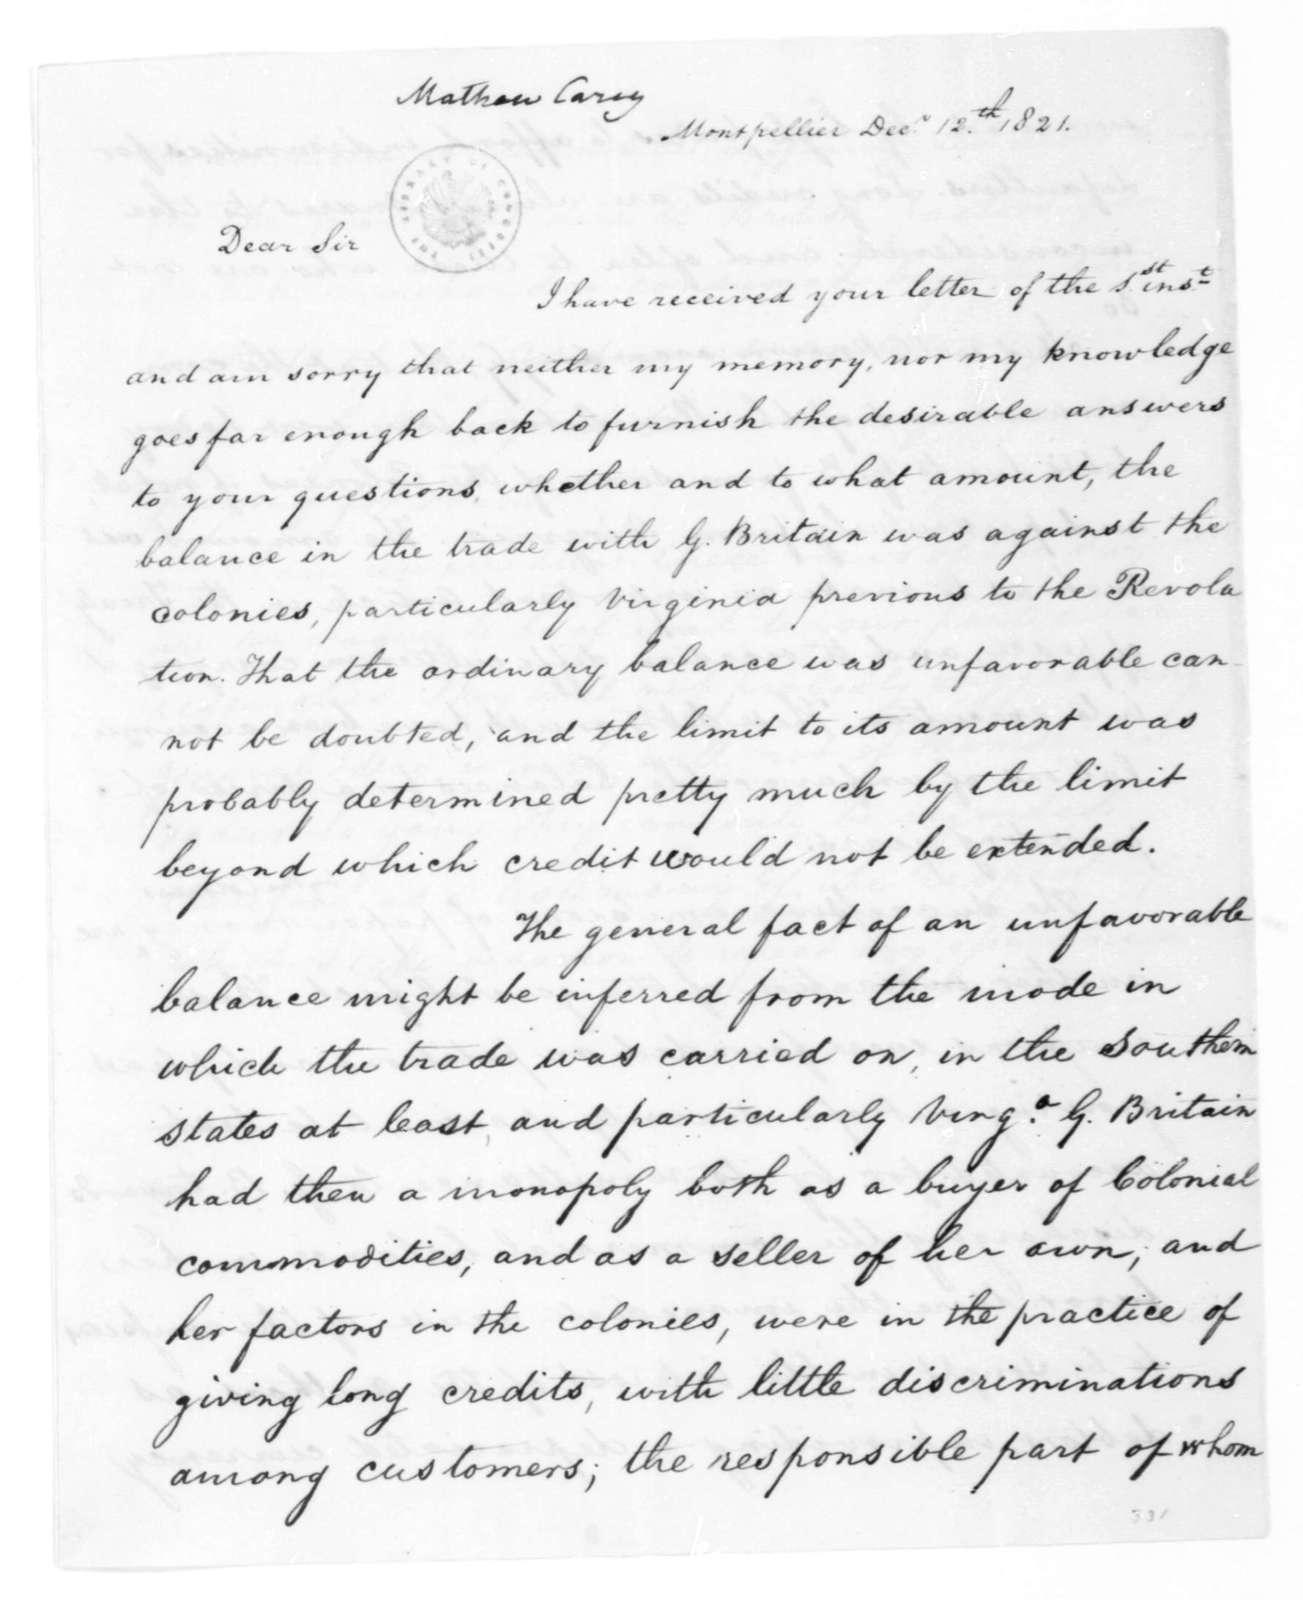 James Madison to Mathew Carey, December 12, 1821.